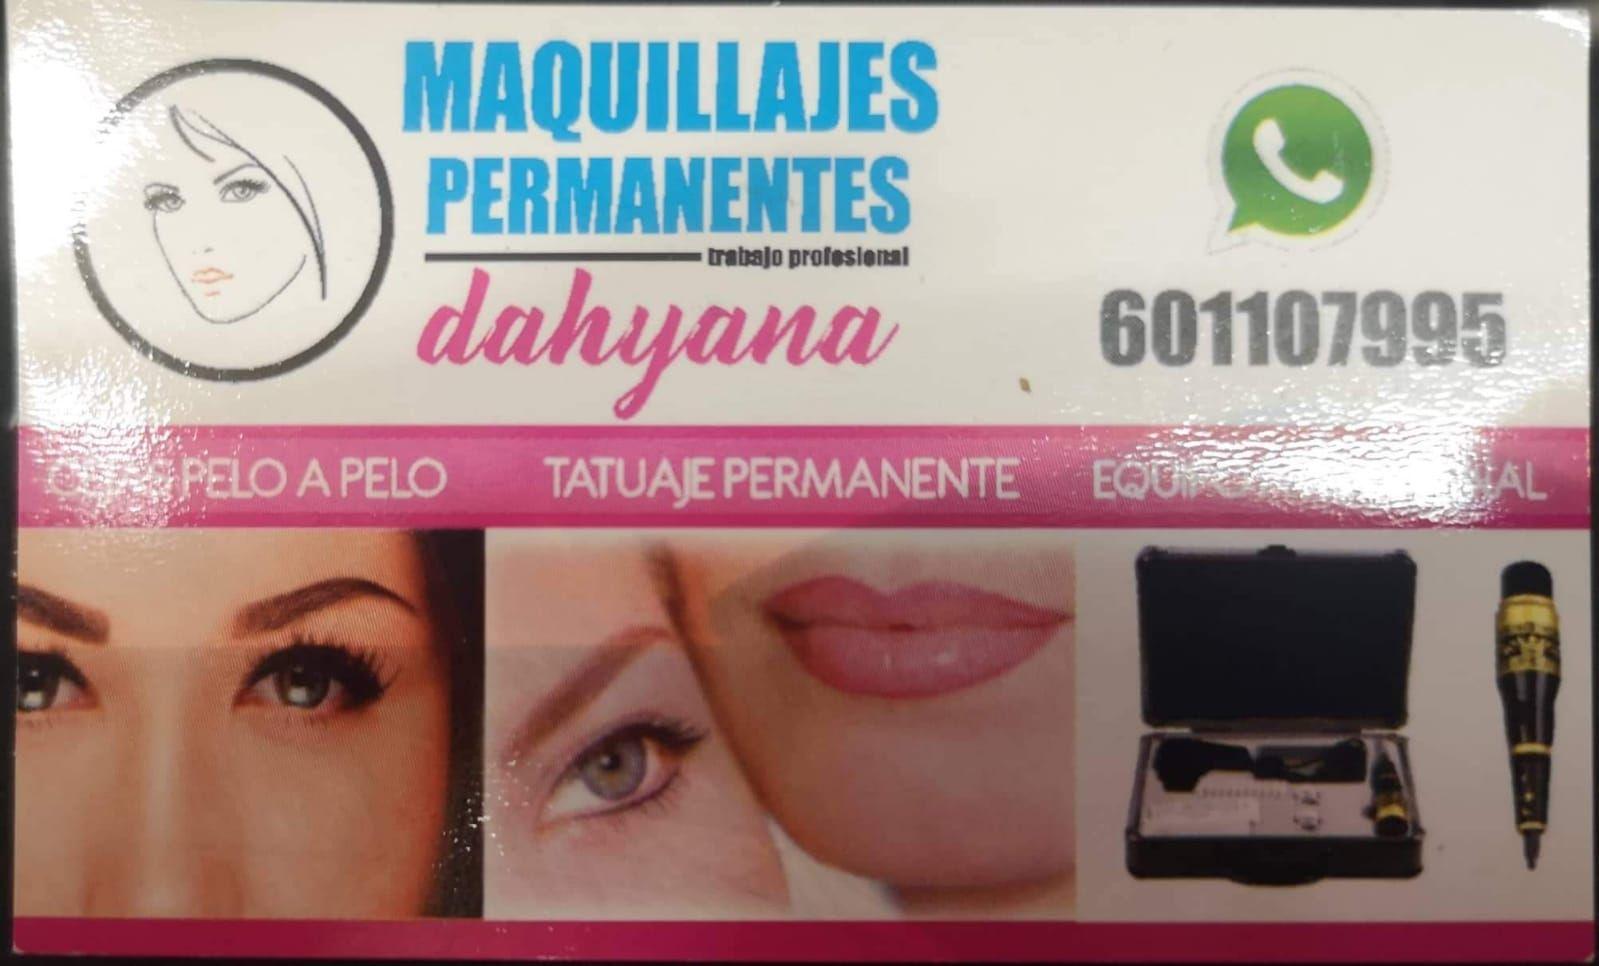 Centro de micropigmentacionen Salamanca